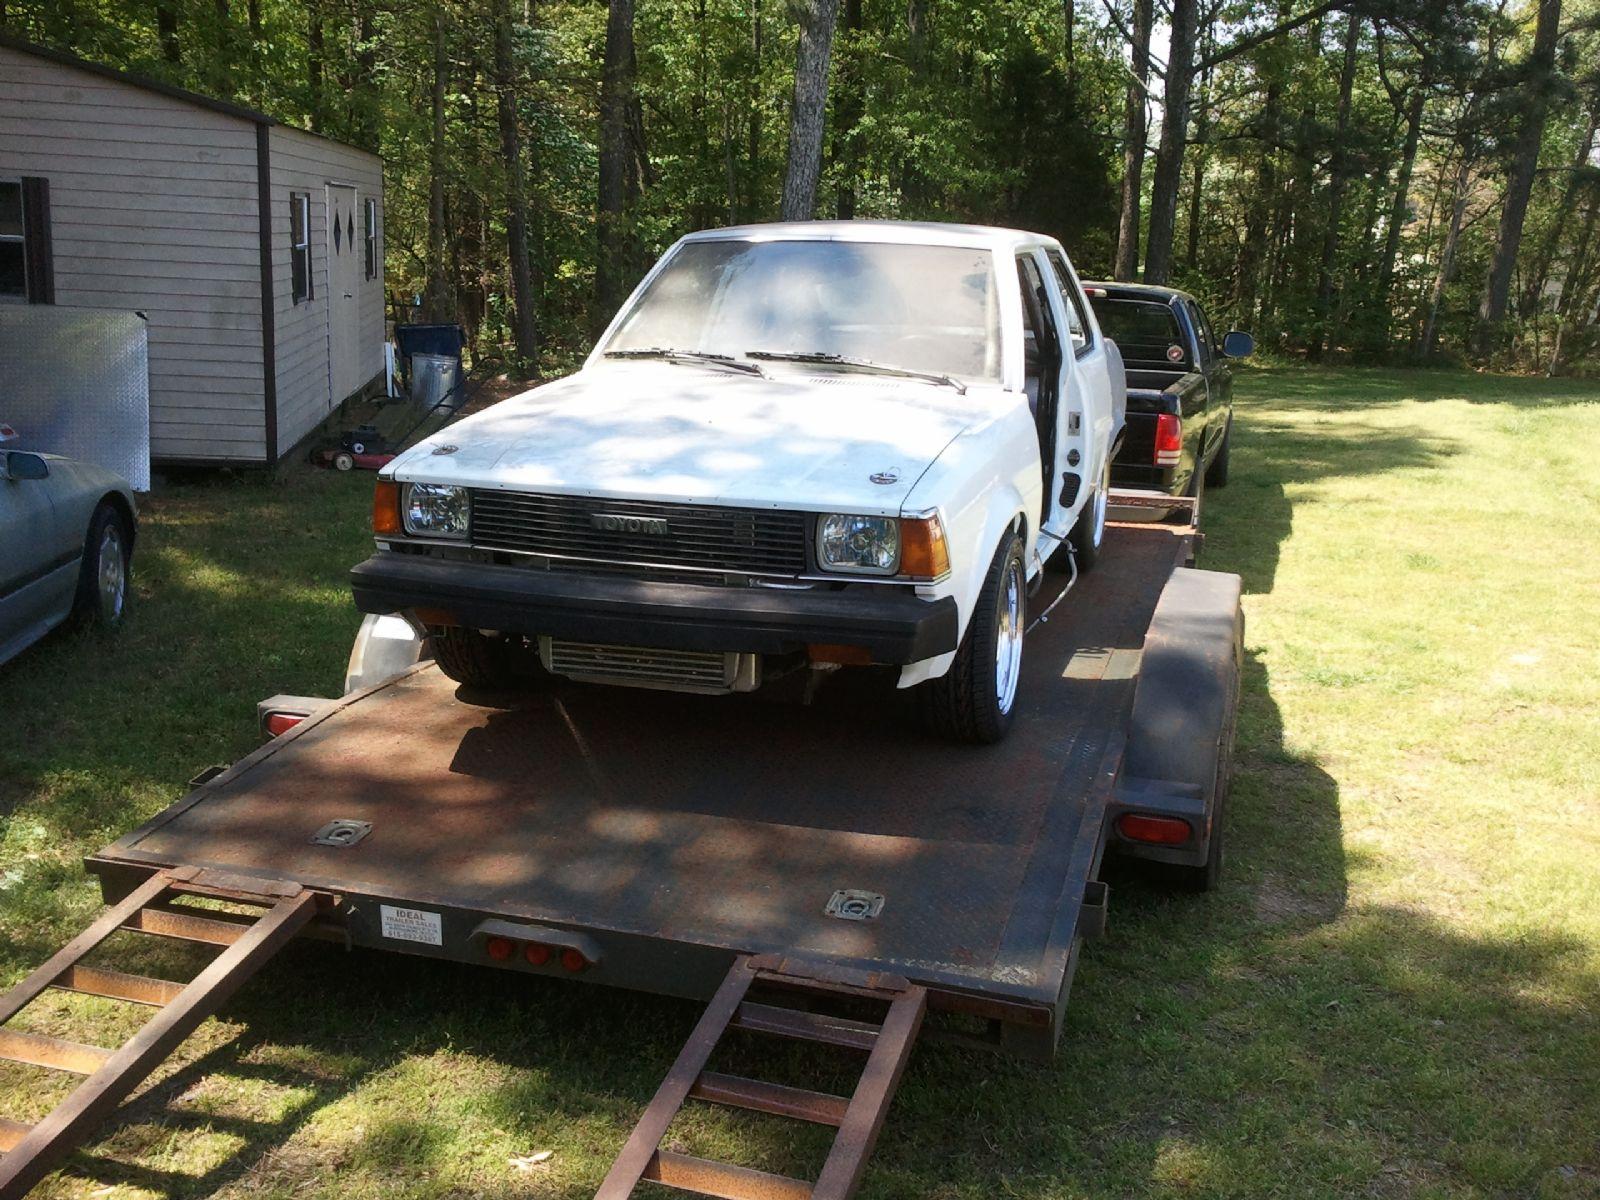 1983 Toyota ke70 Corolla 1jz corolla turbo For Sale